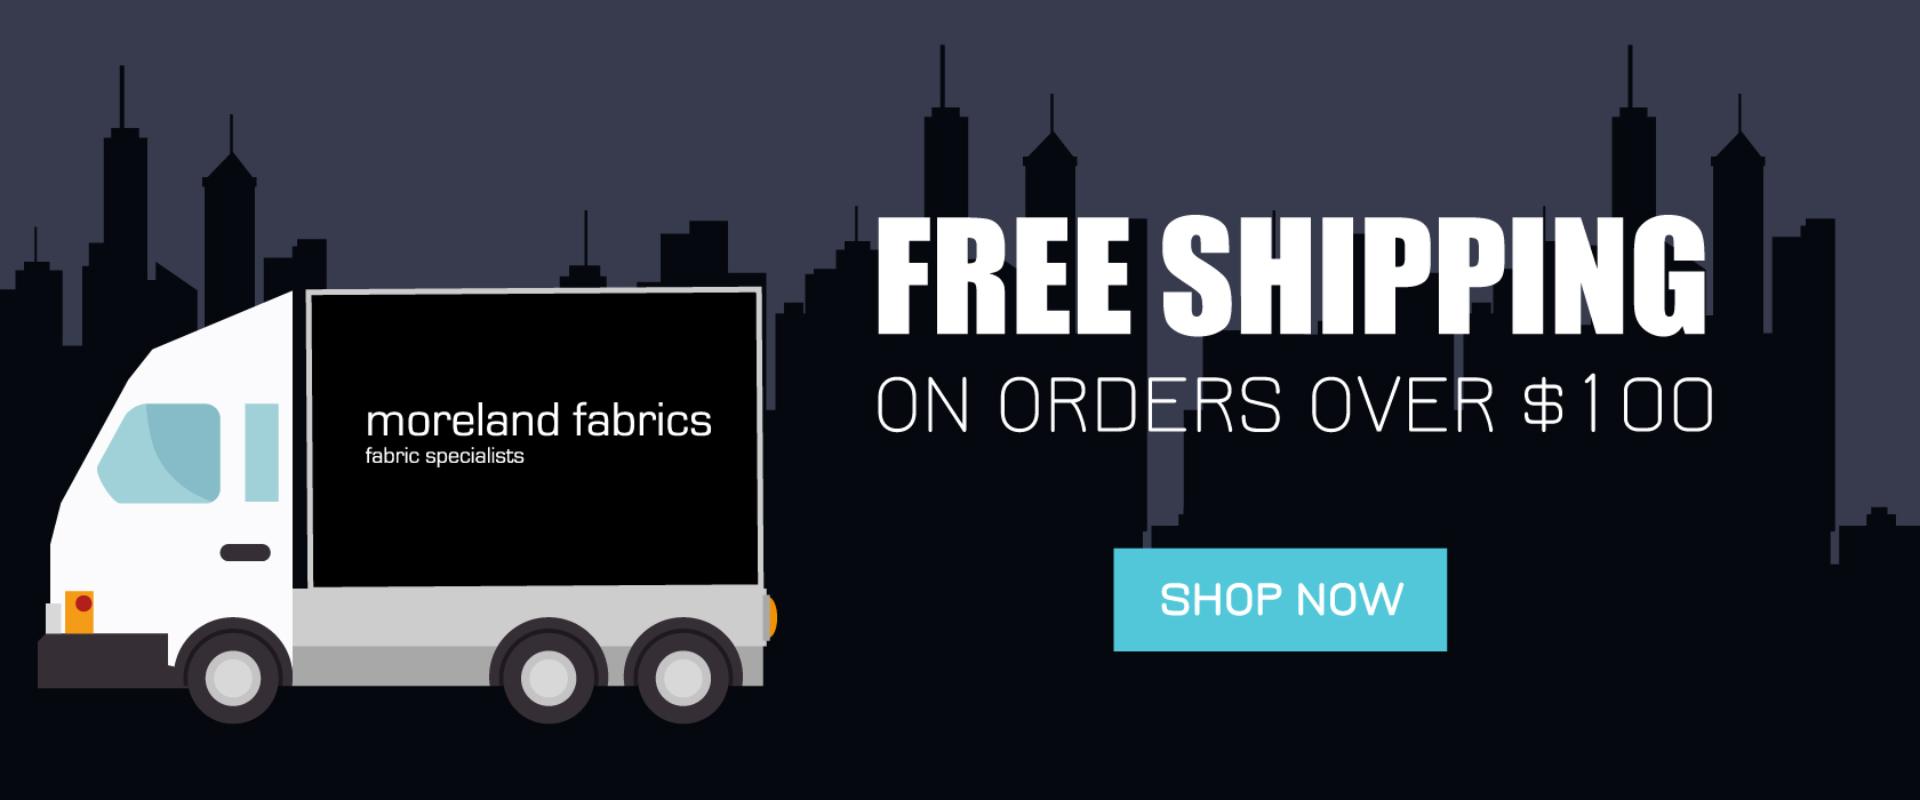 free-shipping-slide